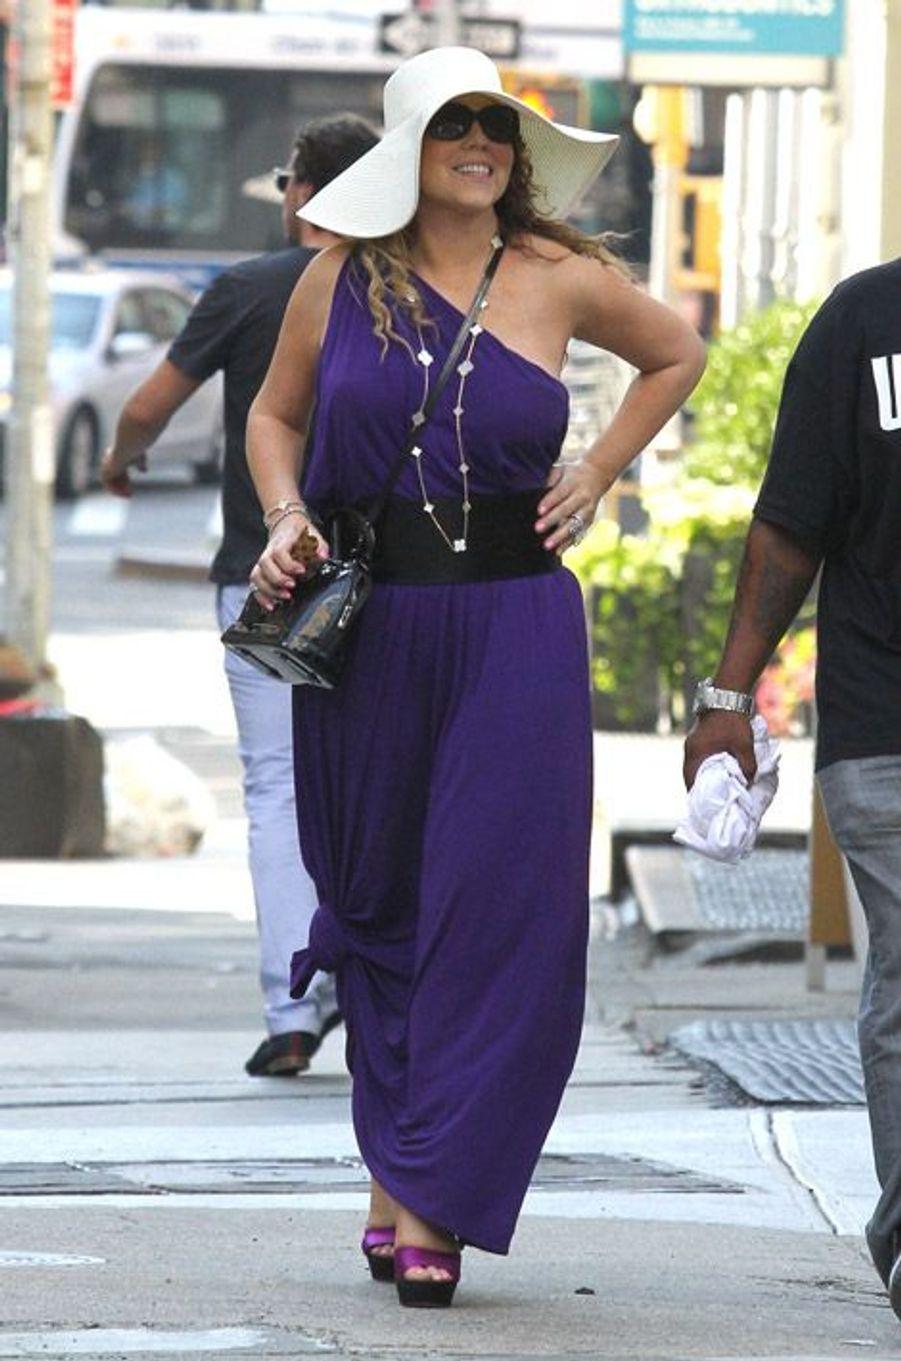 La chanteuse Mariah Carey dans les rues de New York, le 25 août 2014